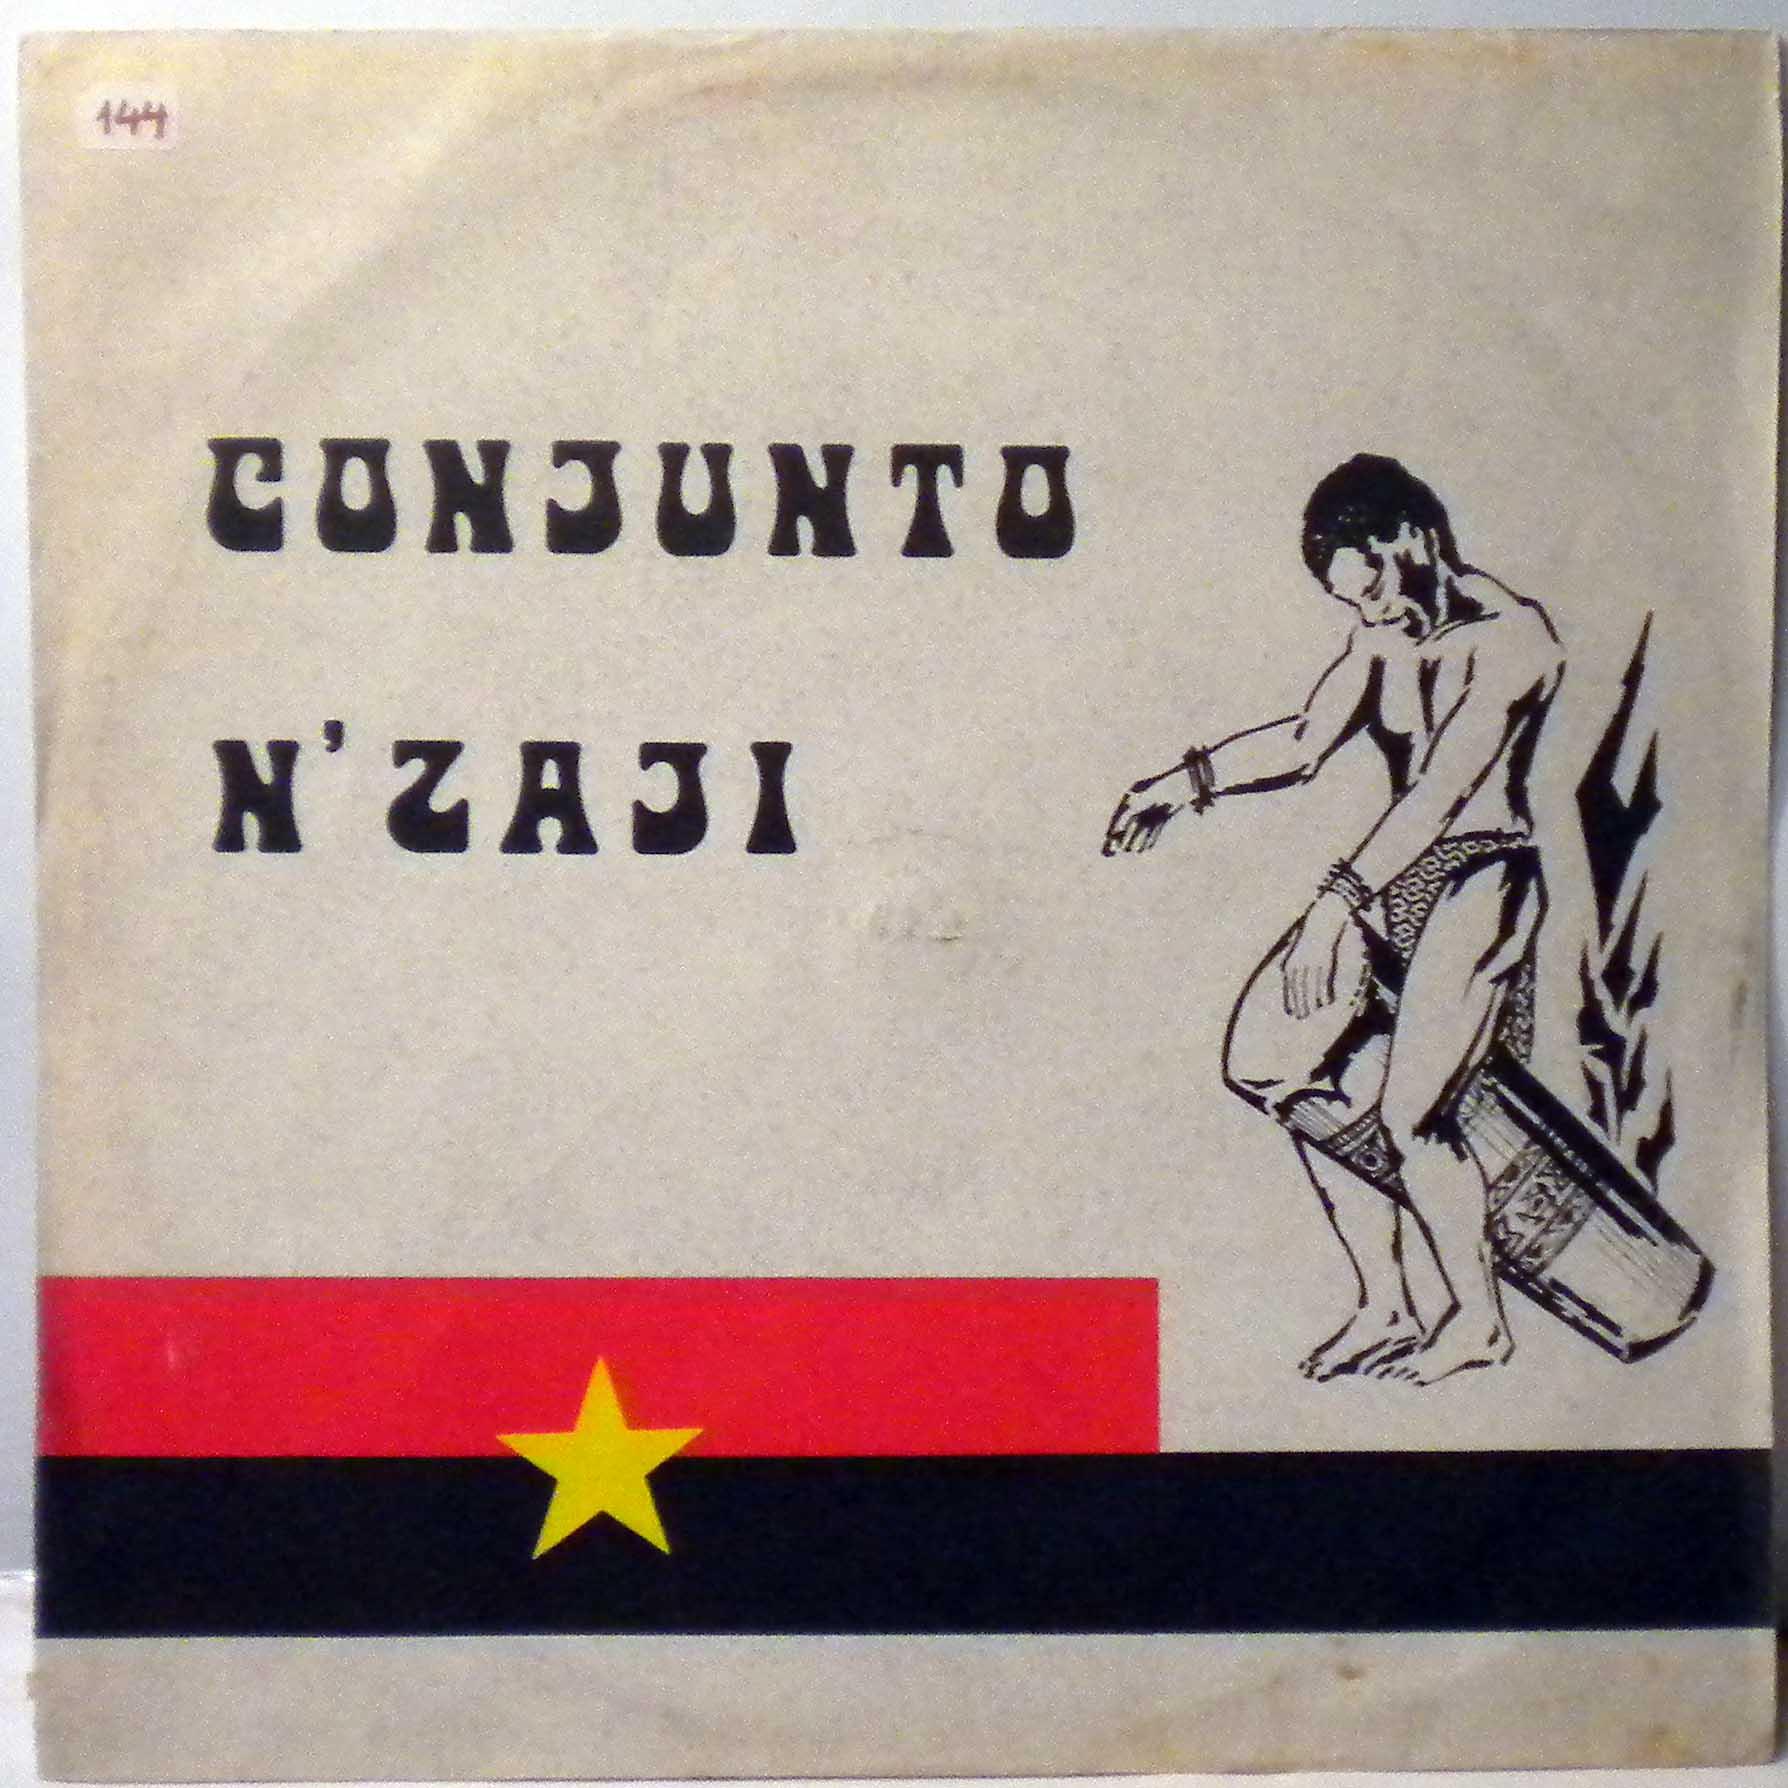 CONJUNTO N'ZAJI - Musica popular Angolana - LP